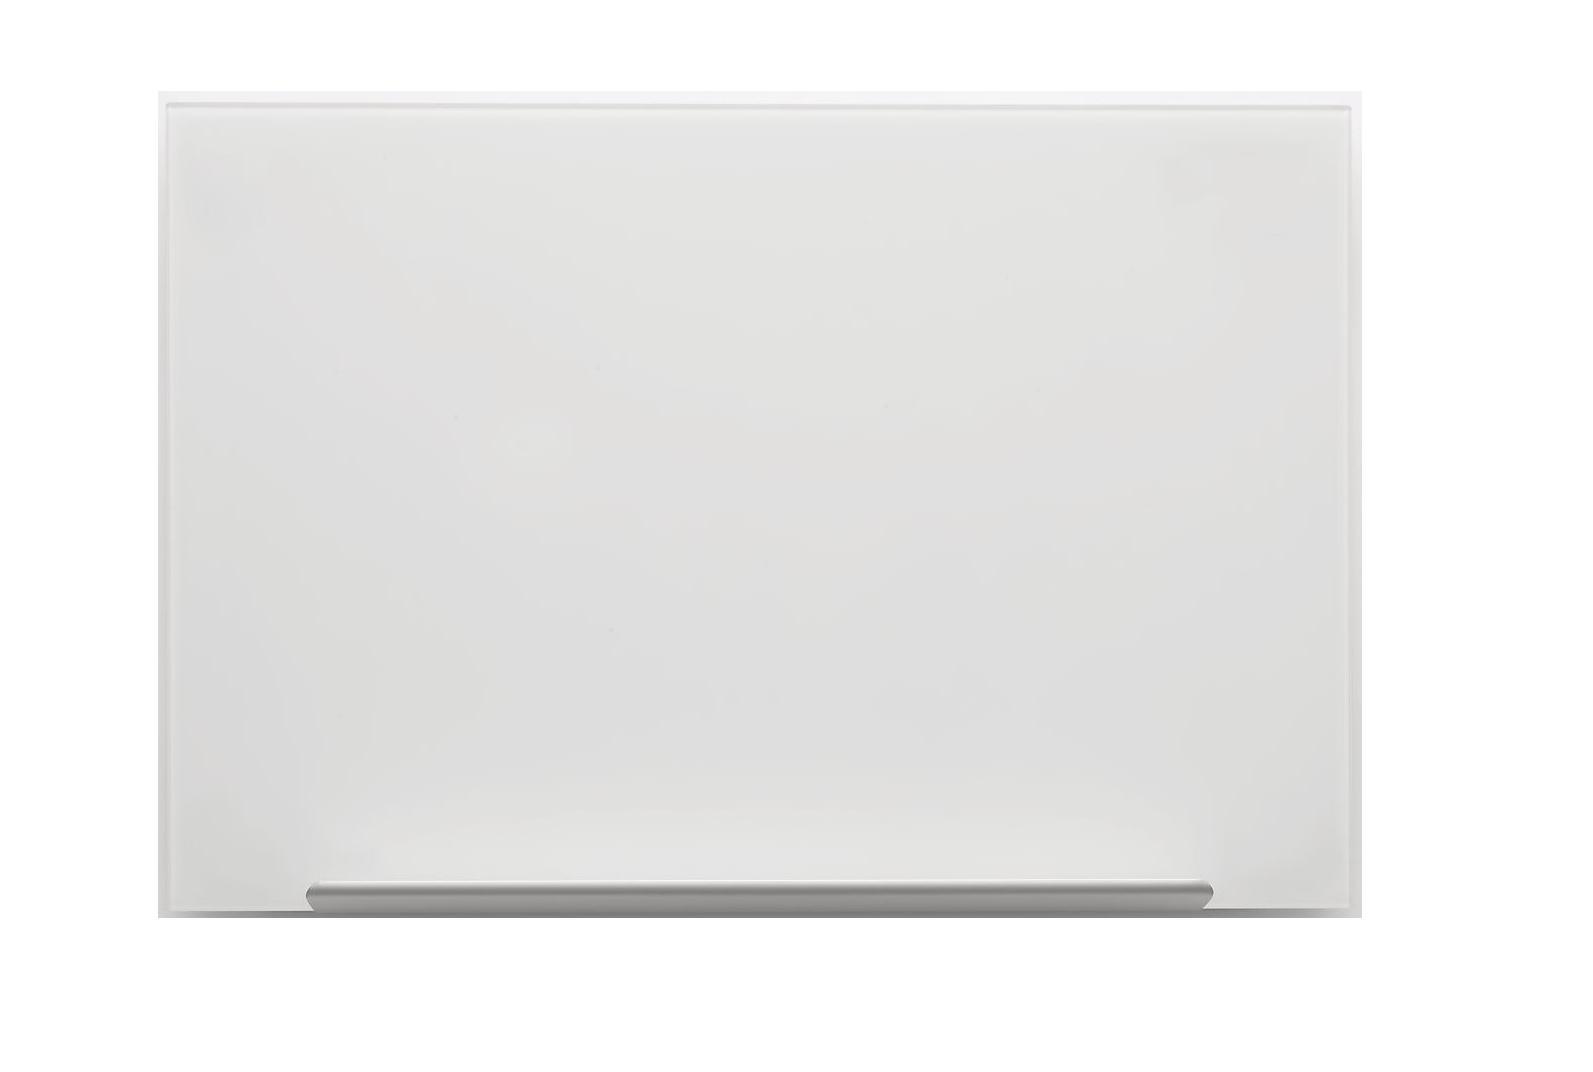 Nobo Pizarra de cristal Diamond magnética color blanco 993x559 mm